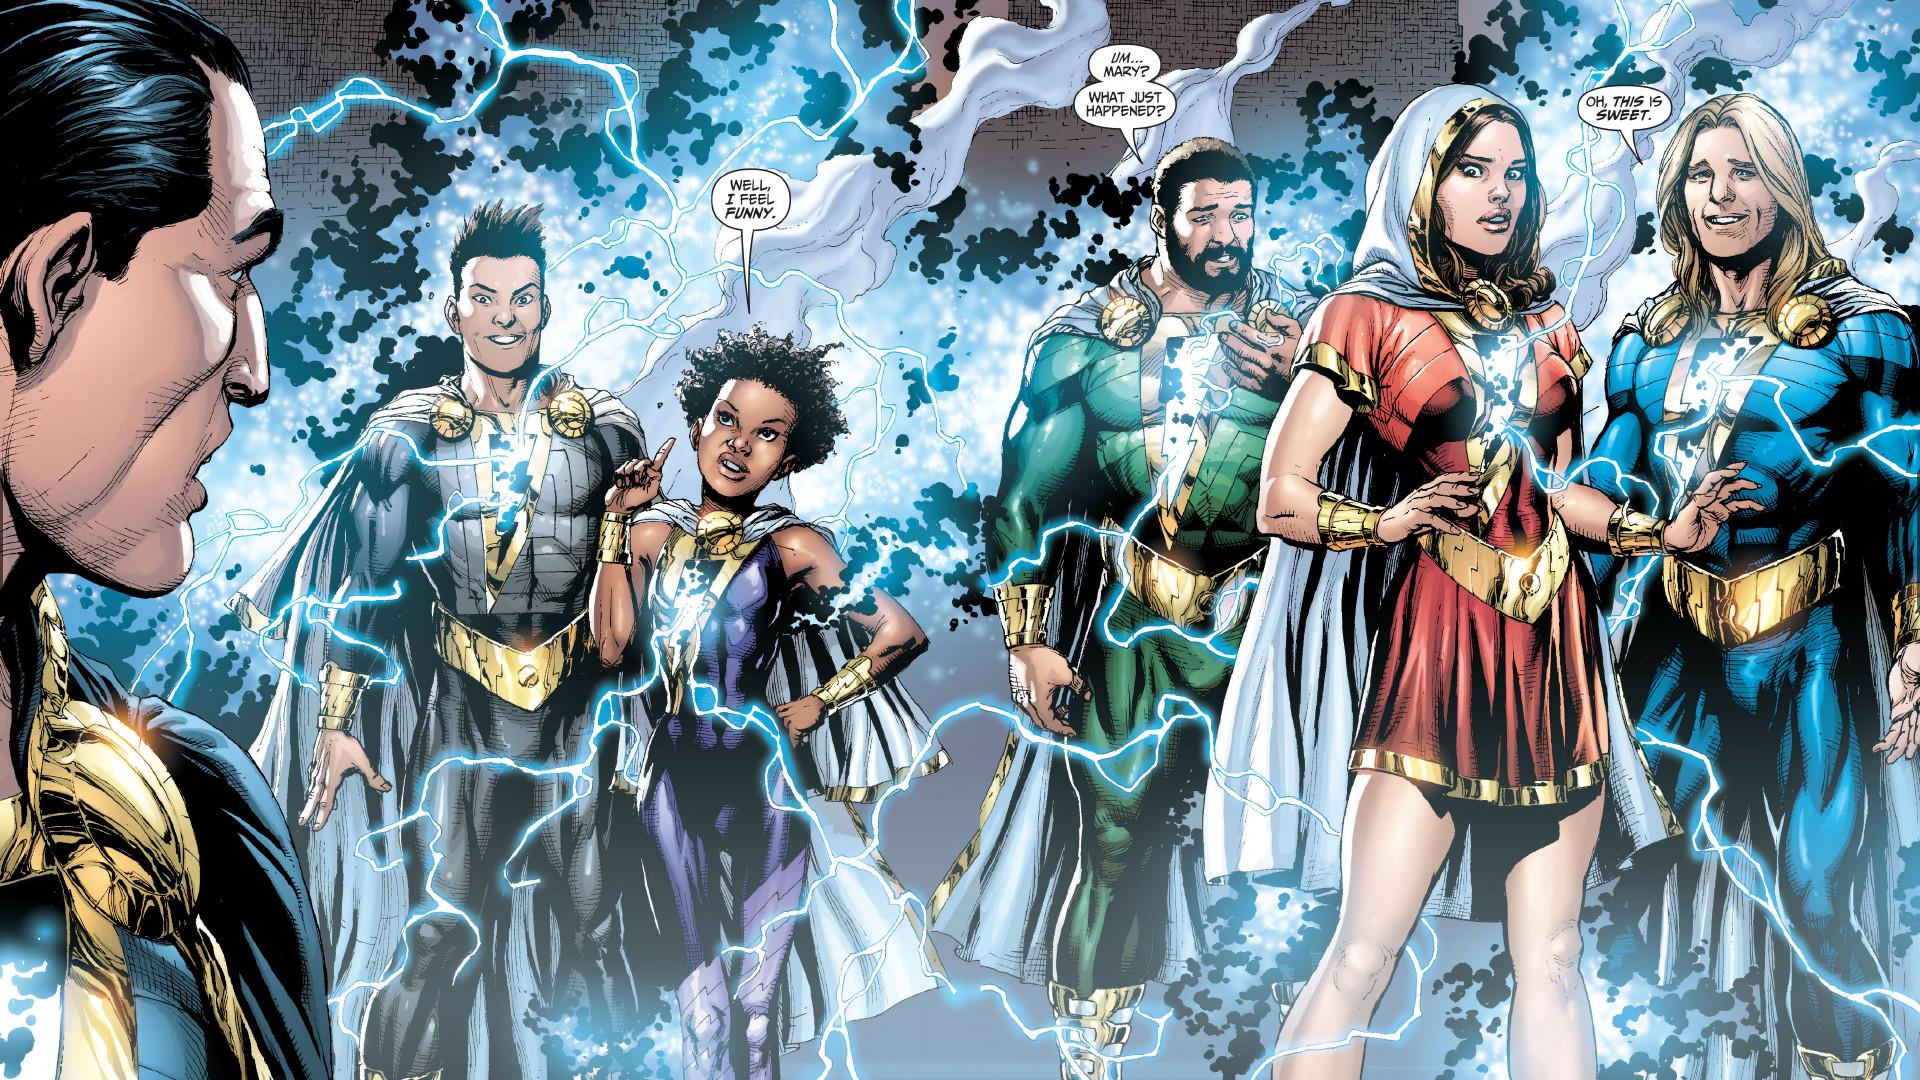 Dc Comics New 52 Wallpaper The pre-new 52 flashpoint